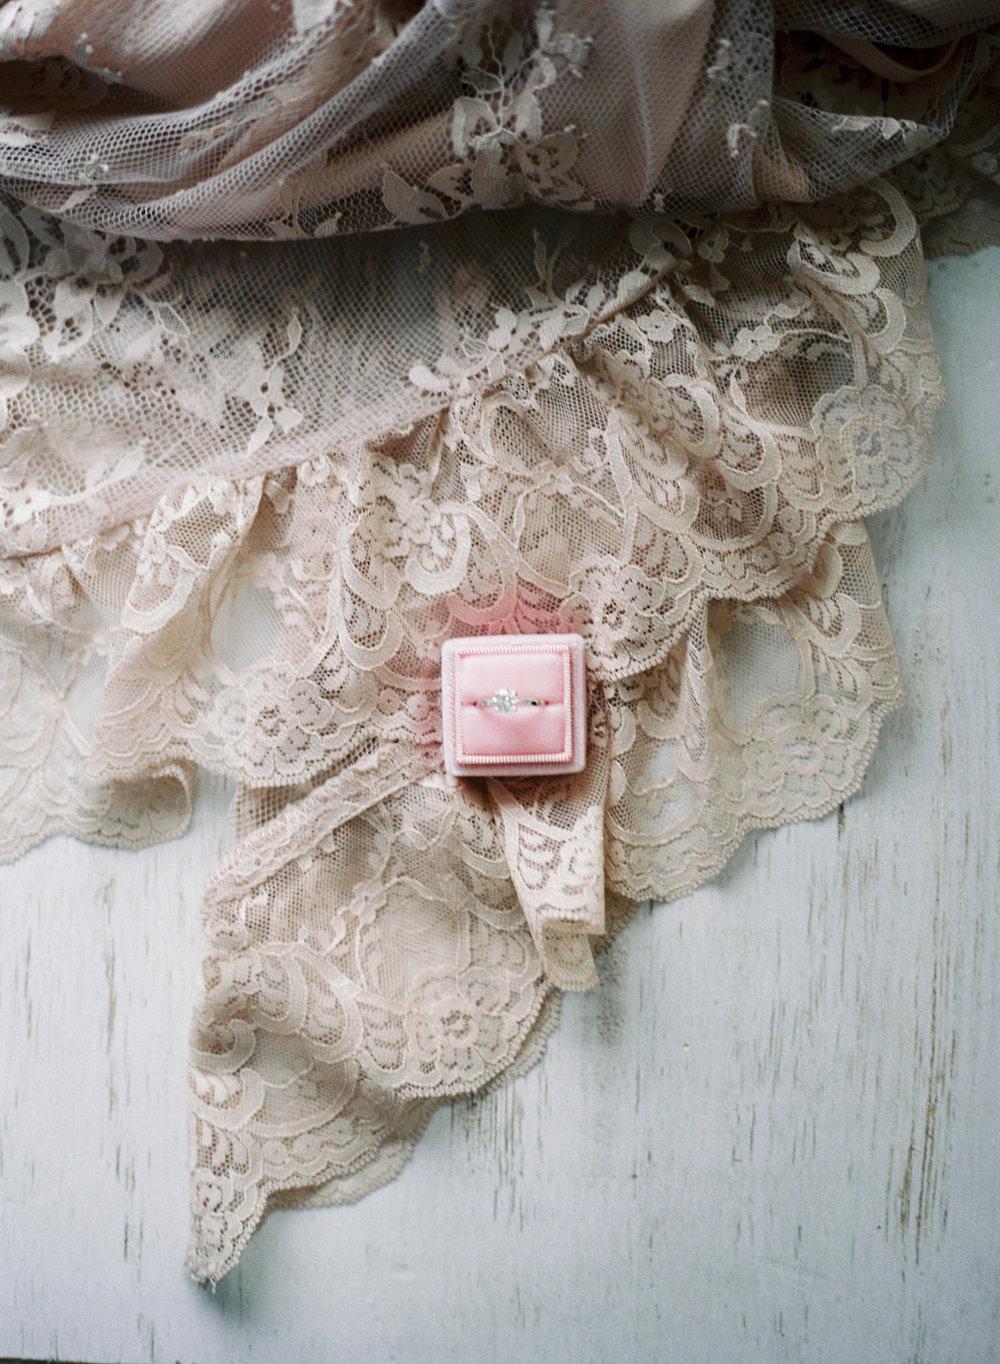 Luxury Wedding Planner UK | Our Chic & Romantic Engagement Shoot in Bath | Katie Julia Photography - 11.JPG